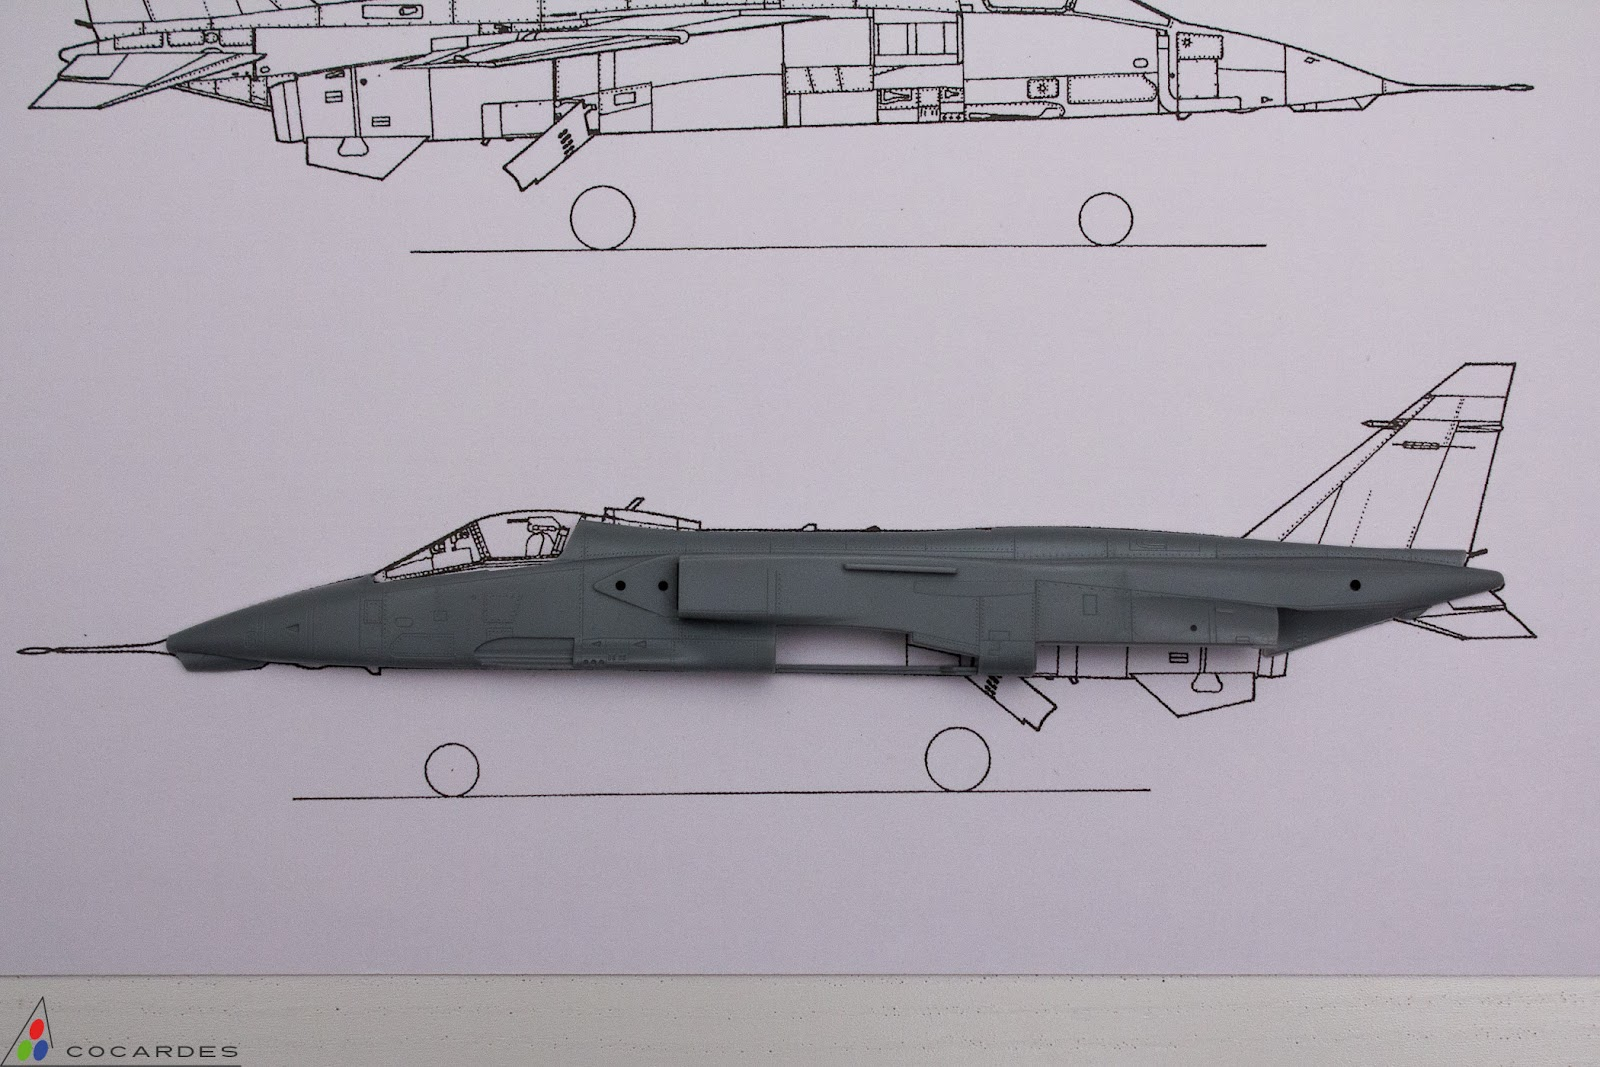 AeroSpirit  maquette miniature SEPECAT Jaguar Royal Air Force XX116 1:72 Corgi